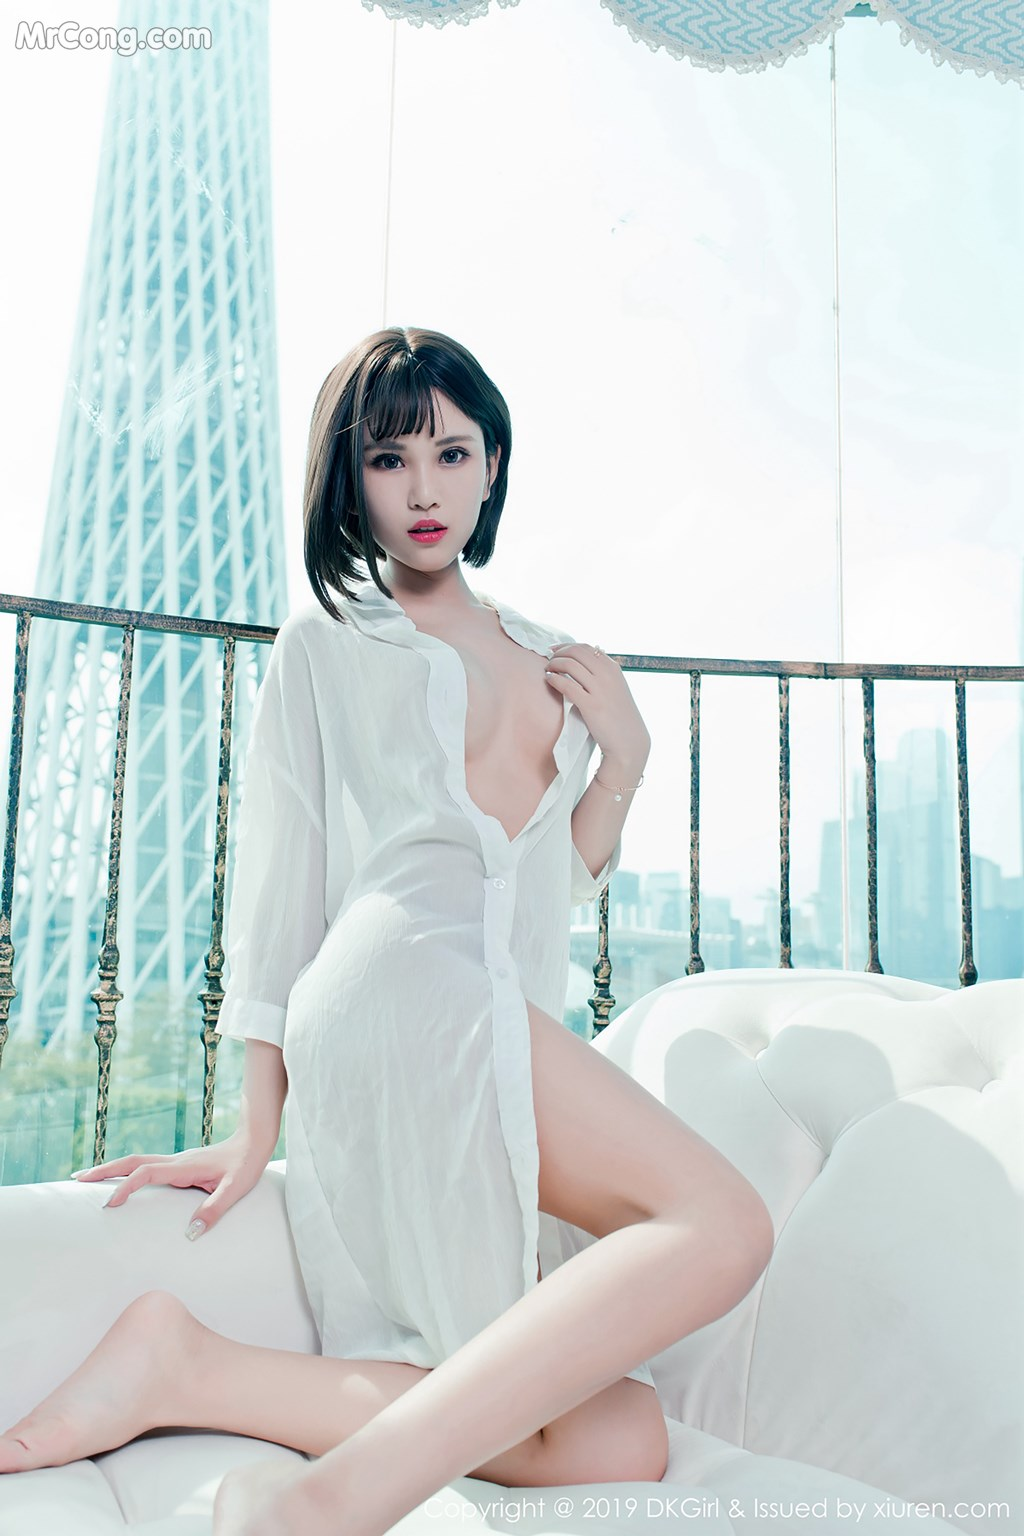 Image DKGirl-Vol.094-Meng-Bao-Er-BoA-MrCong.com-009 in post DKGirl Vol.094: Người mẫu Meng Bao Er (萌宝儿BoA) (48 ảnh)